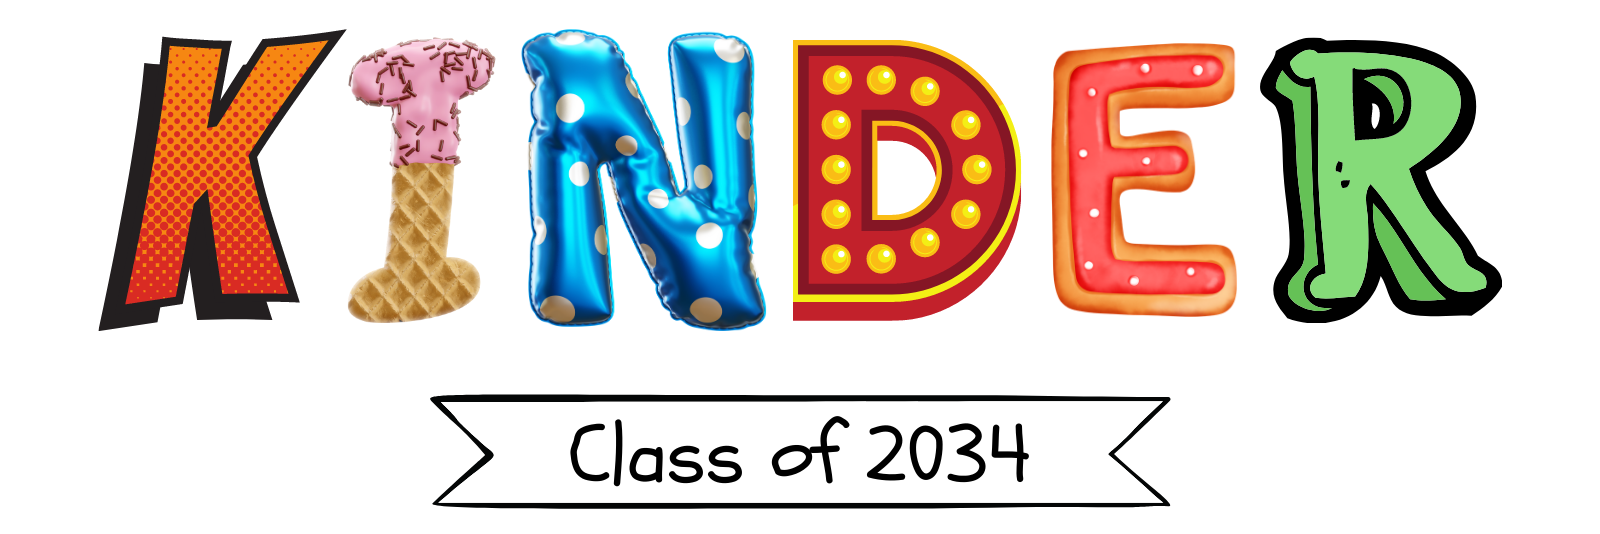 Kinder Class of 2034